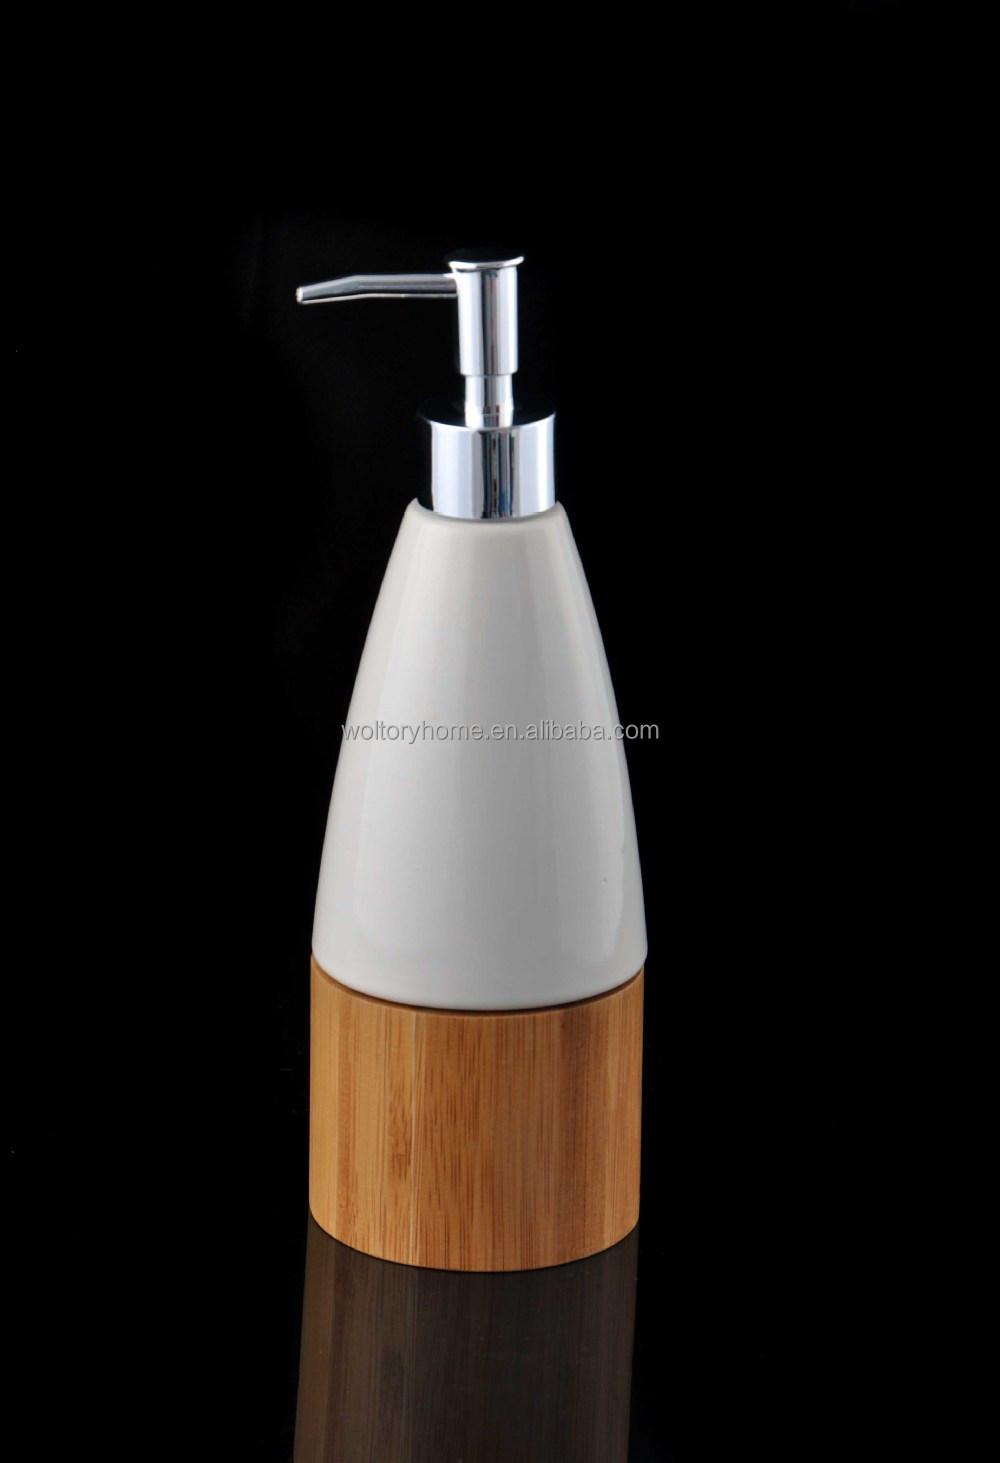 Retail Natural Bamboo And Ceramic Bath Accessories Set